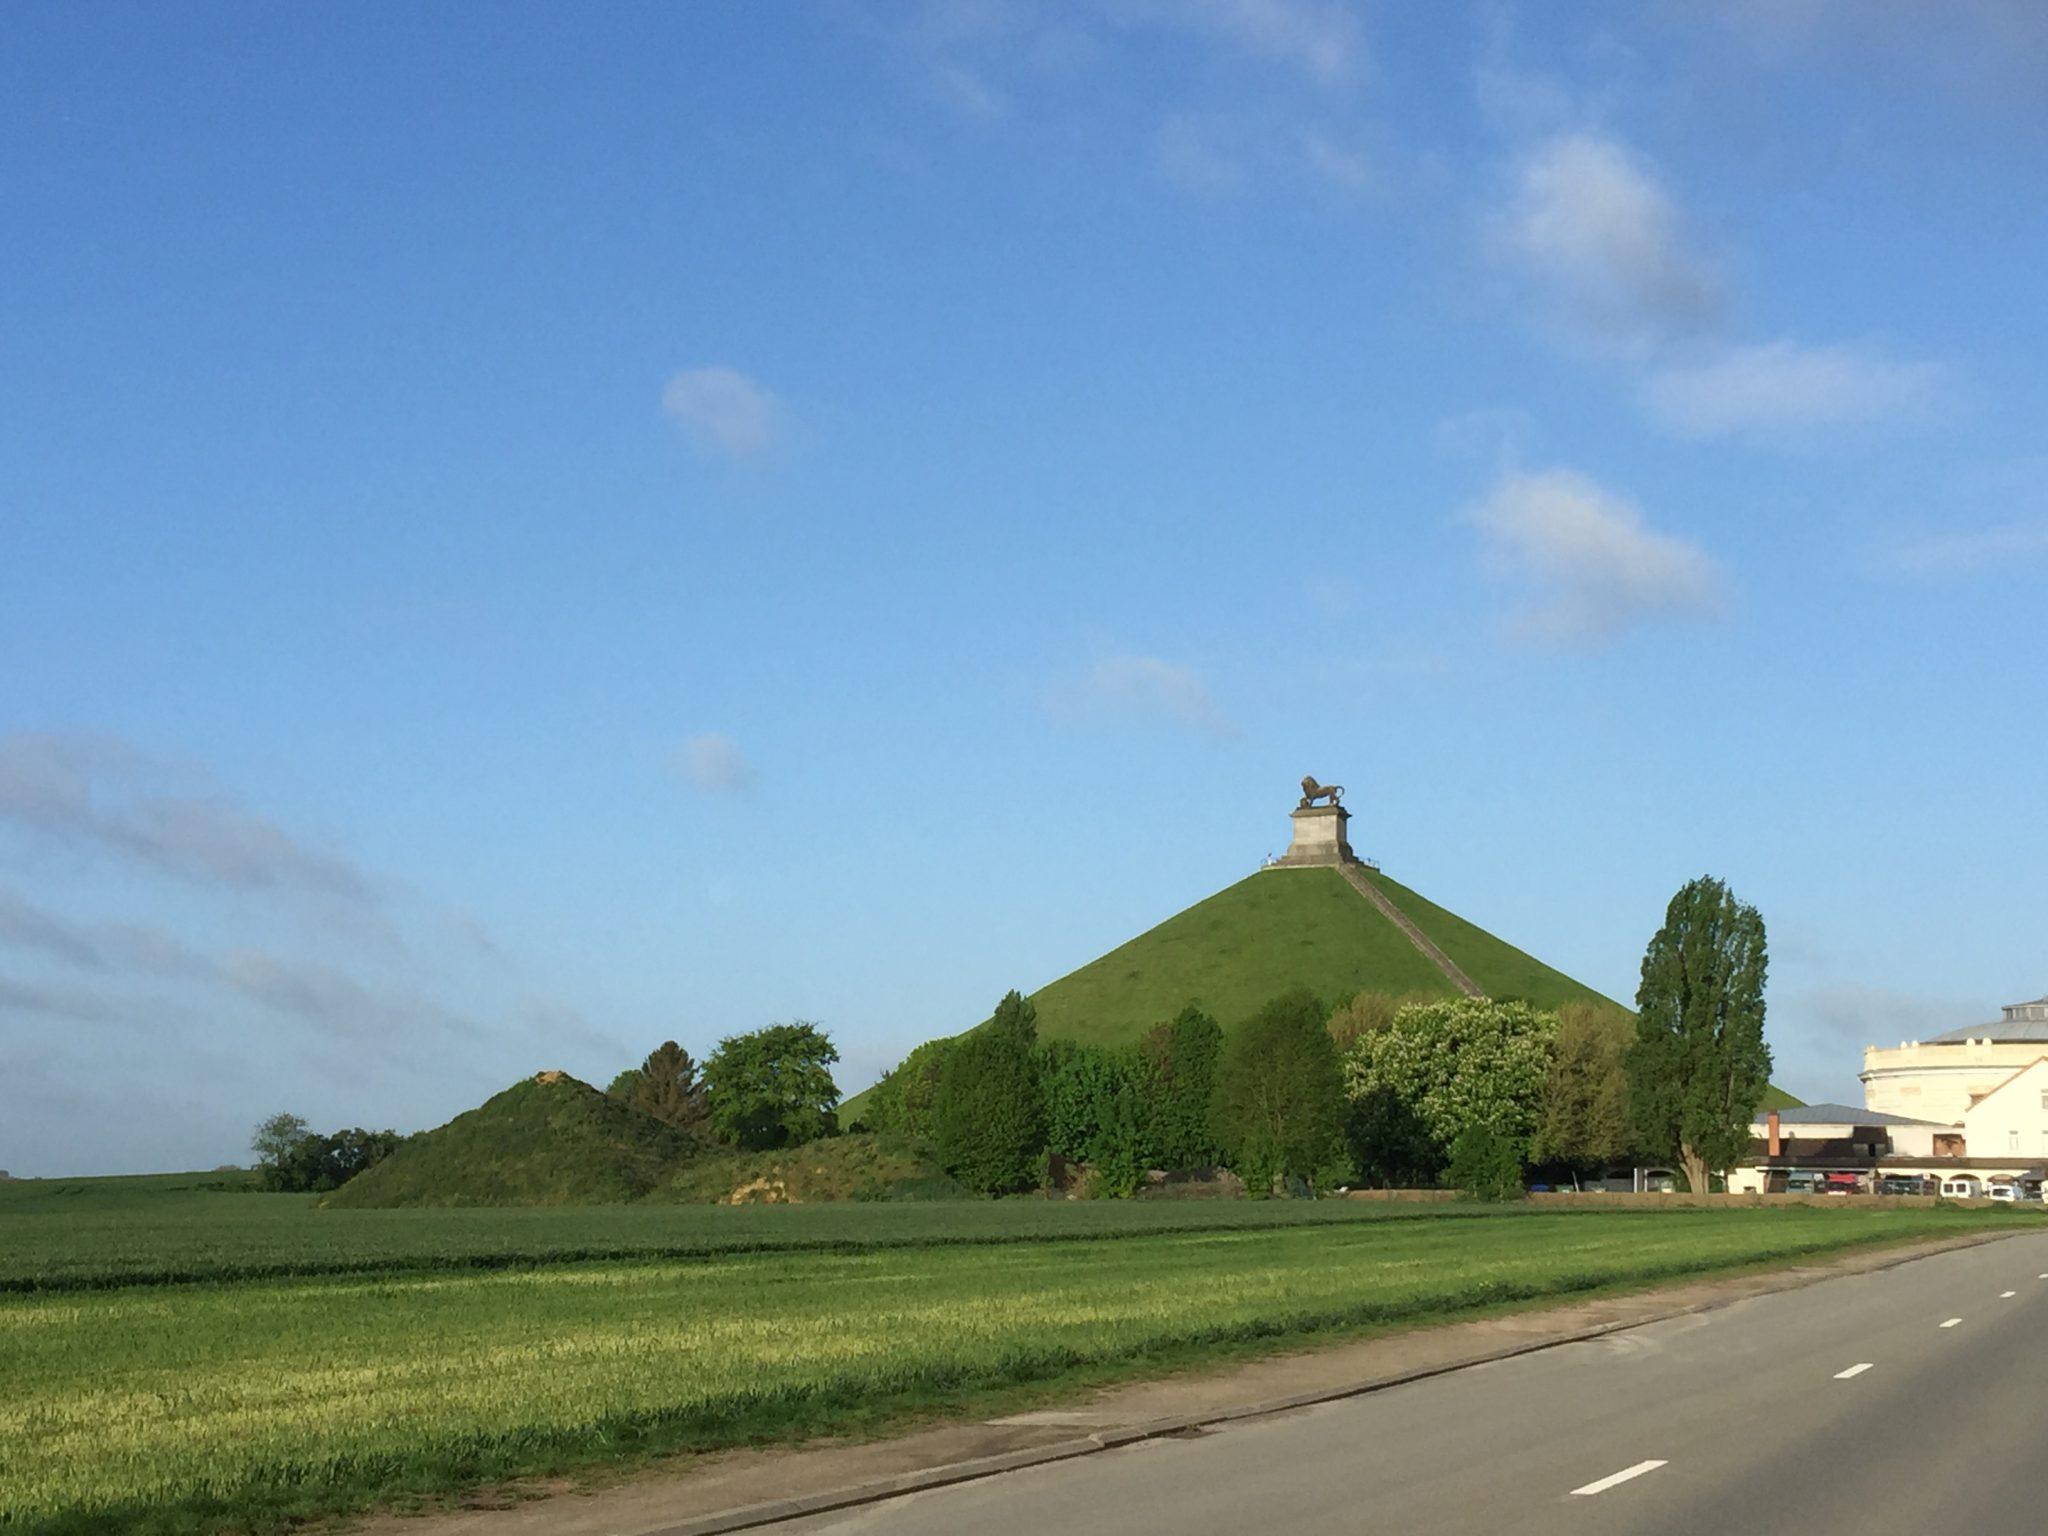 Visiting Waterloo – Project Hougoumont & Waterloo